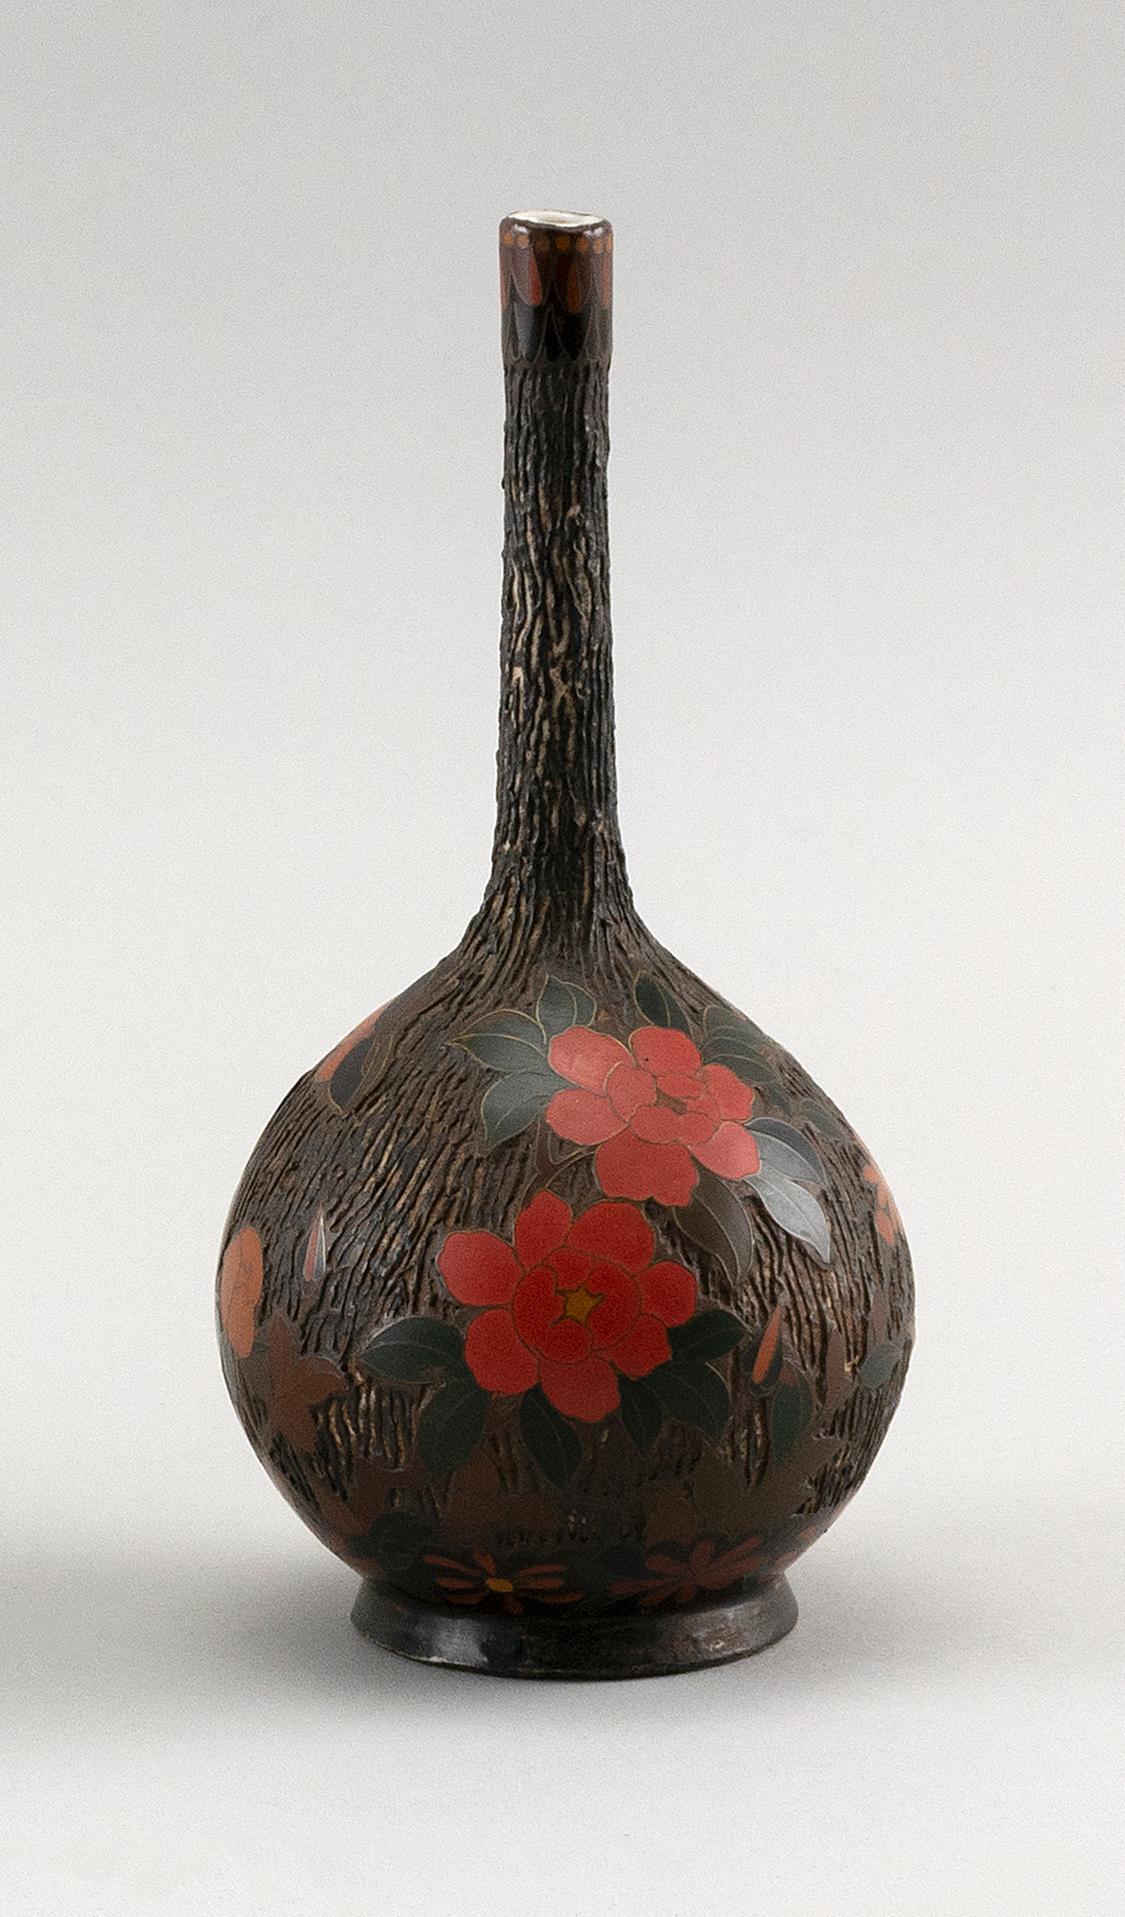 "JAPANESE TOTAI SHIPPO (TREE BARK ENAMEL) CLOISONNÉ-ON-PORCELAIN BOTTLE VASE With floral decoration. Height 7""."